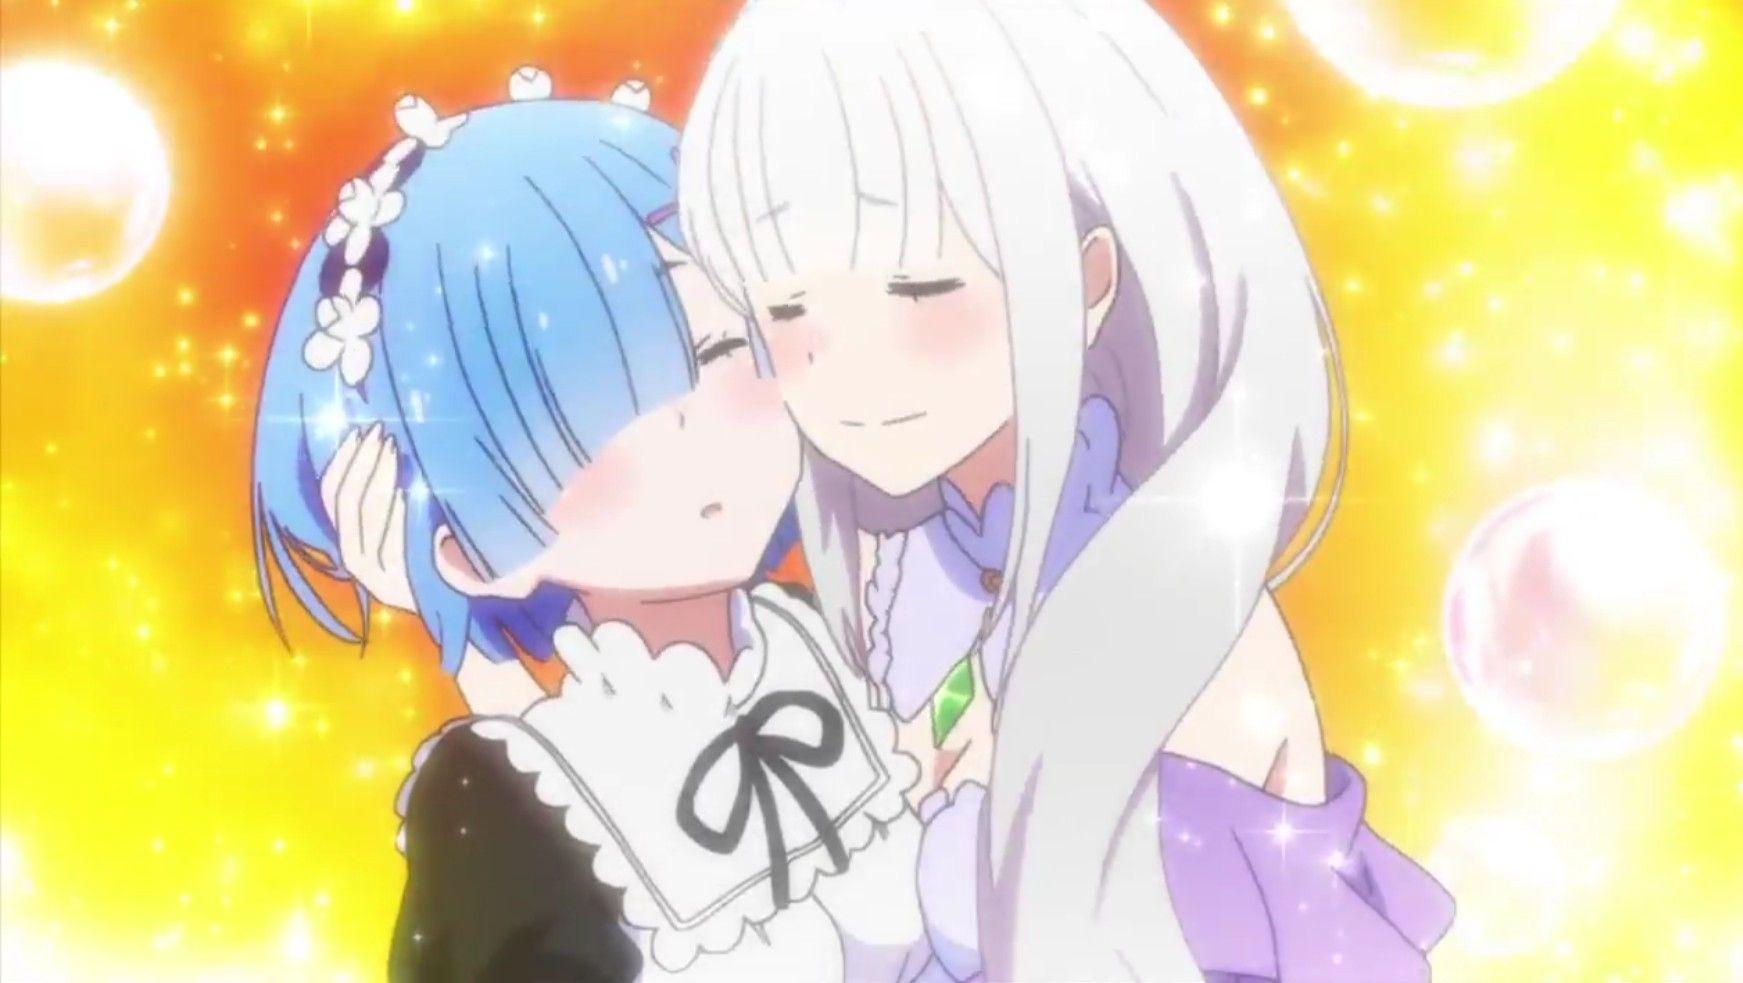 Pin on rezero